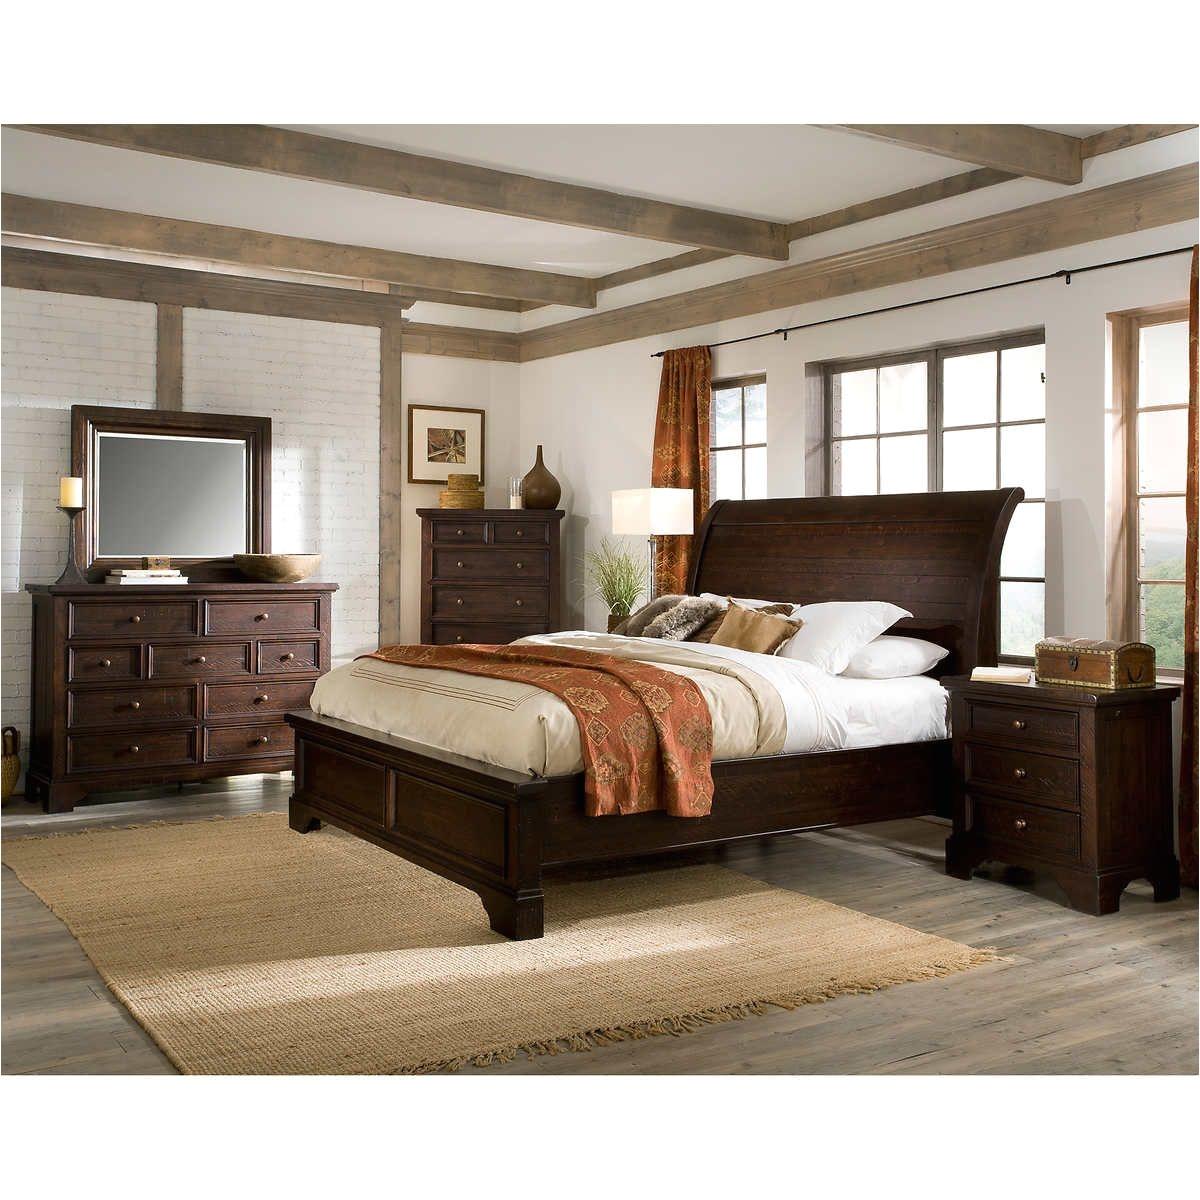 Costco Bedroom Furniture Sale Interior Design Bedroom Ideas A Bud Check more at